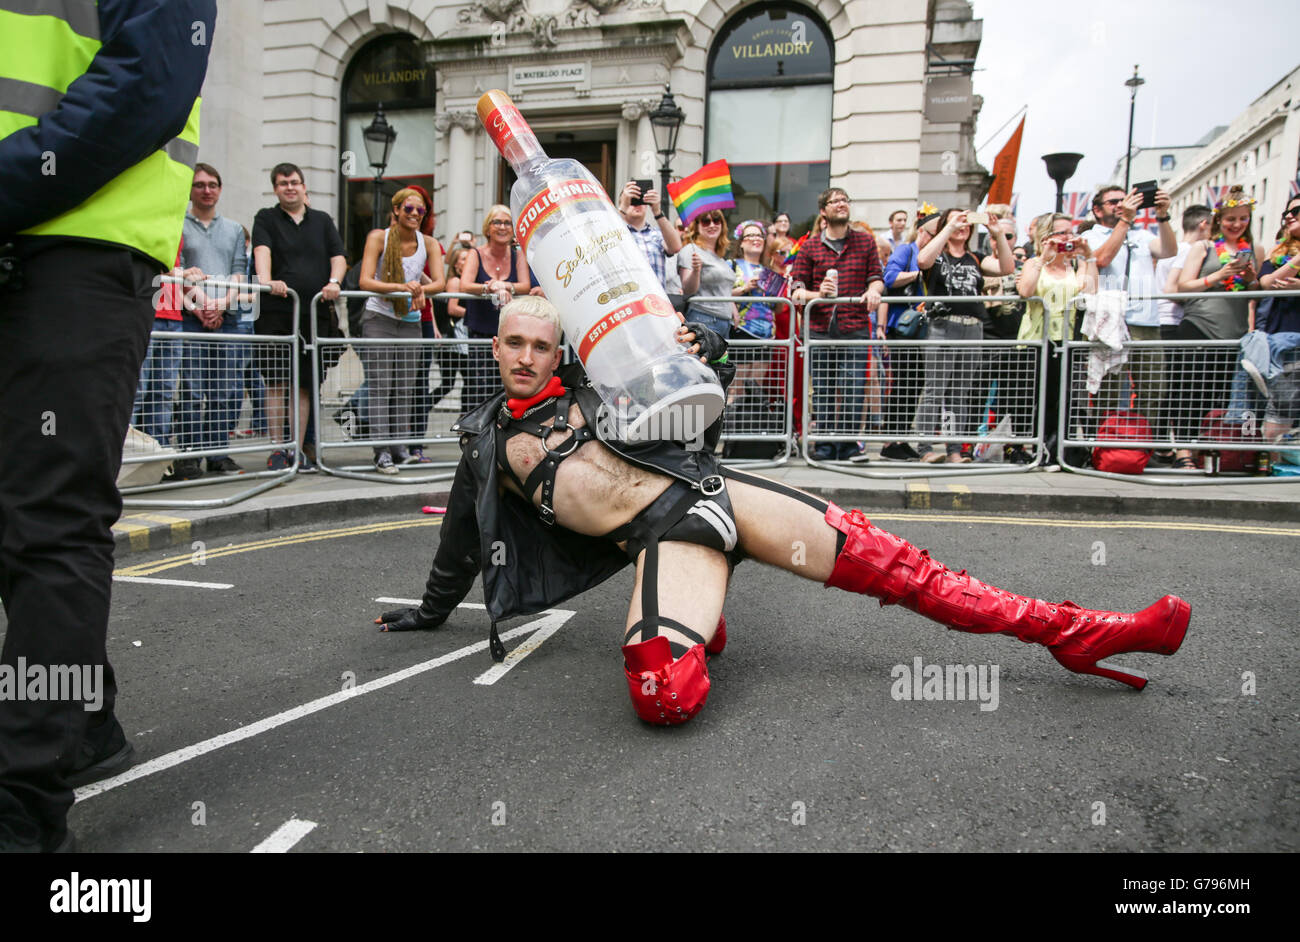 London, UK  25th June, 2016. Pride in London parade. parade participant with Stolnichya 'stoli' vodka bottle - Stock Image